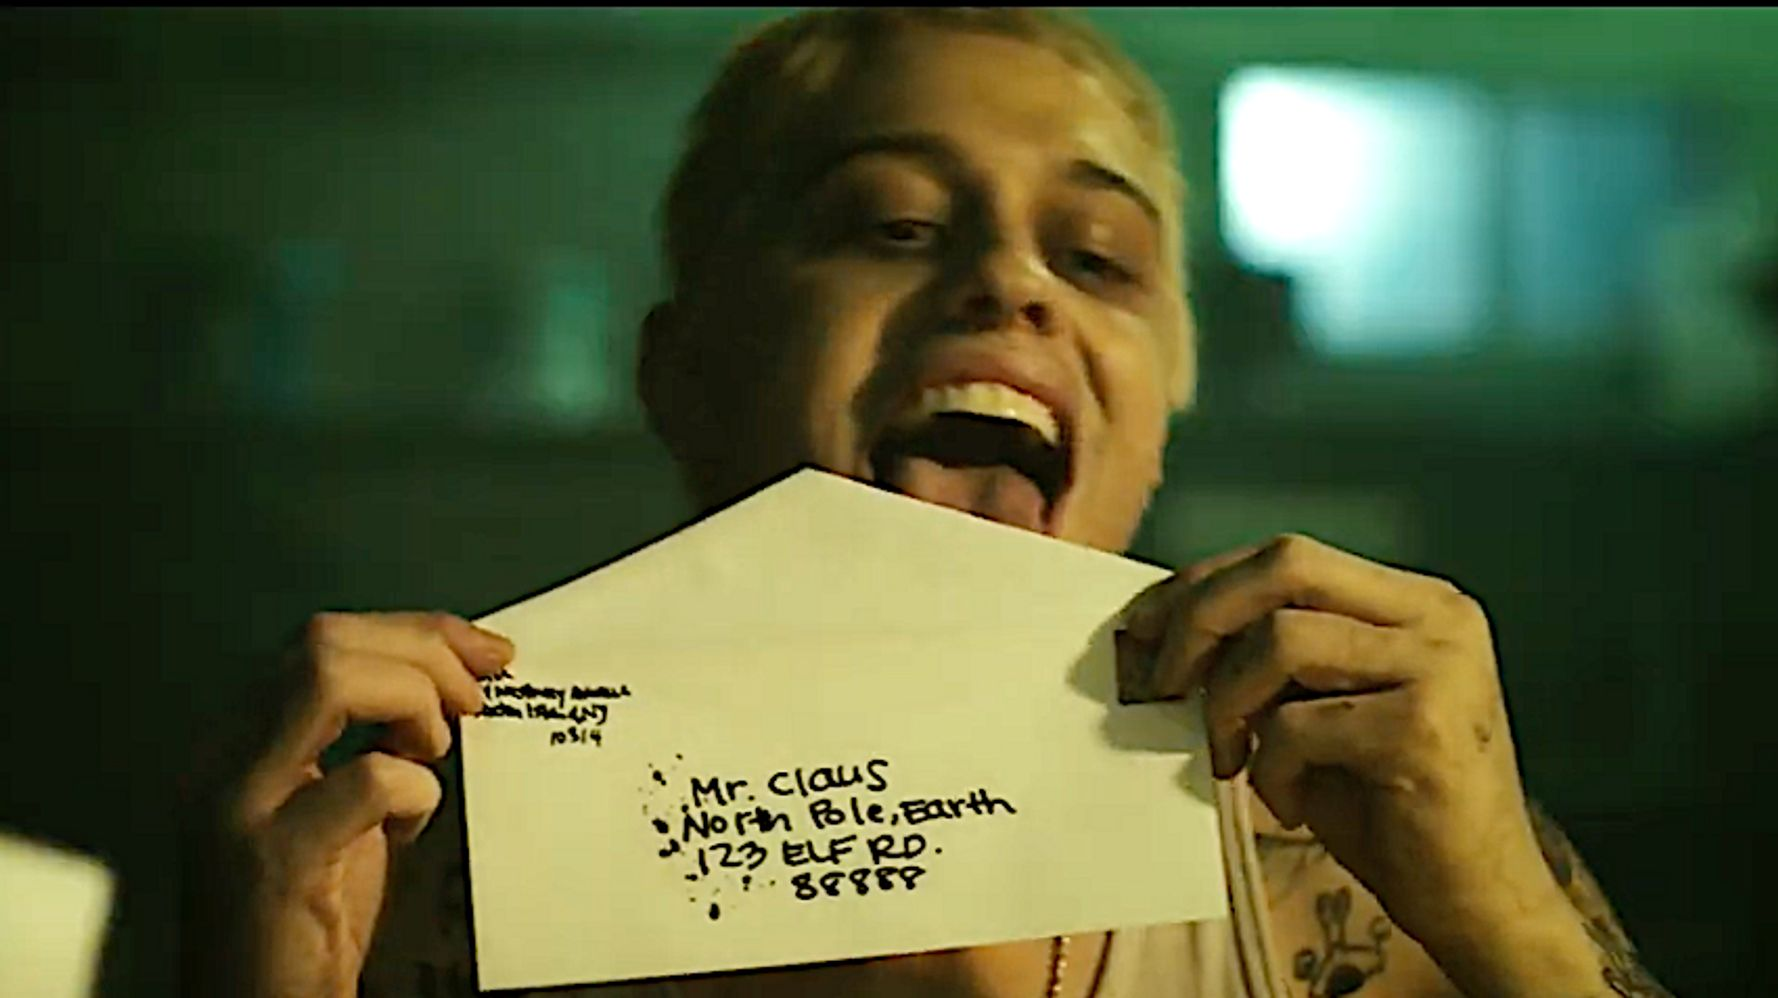 Eminem Pops Up In 'SNL' Cameo As Pete Davidson Sends Up Rapper's 'Stan' Video